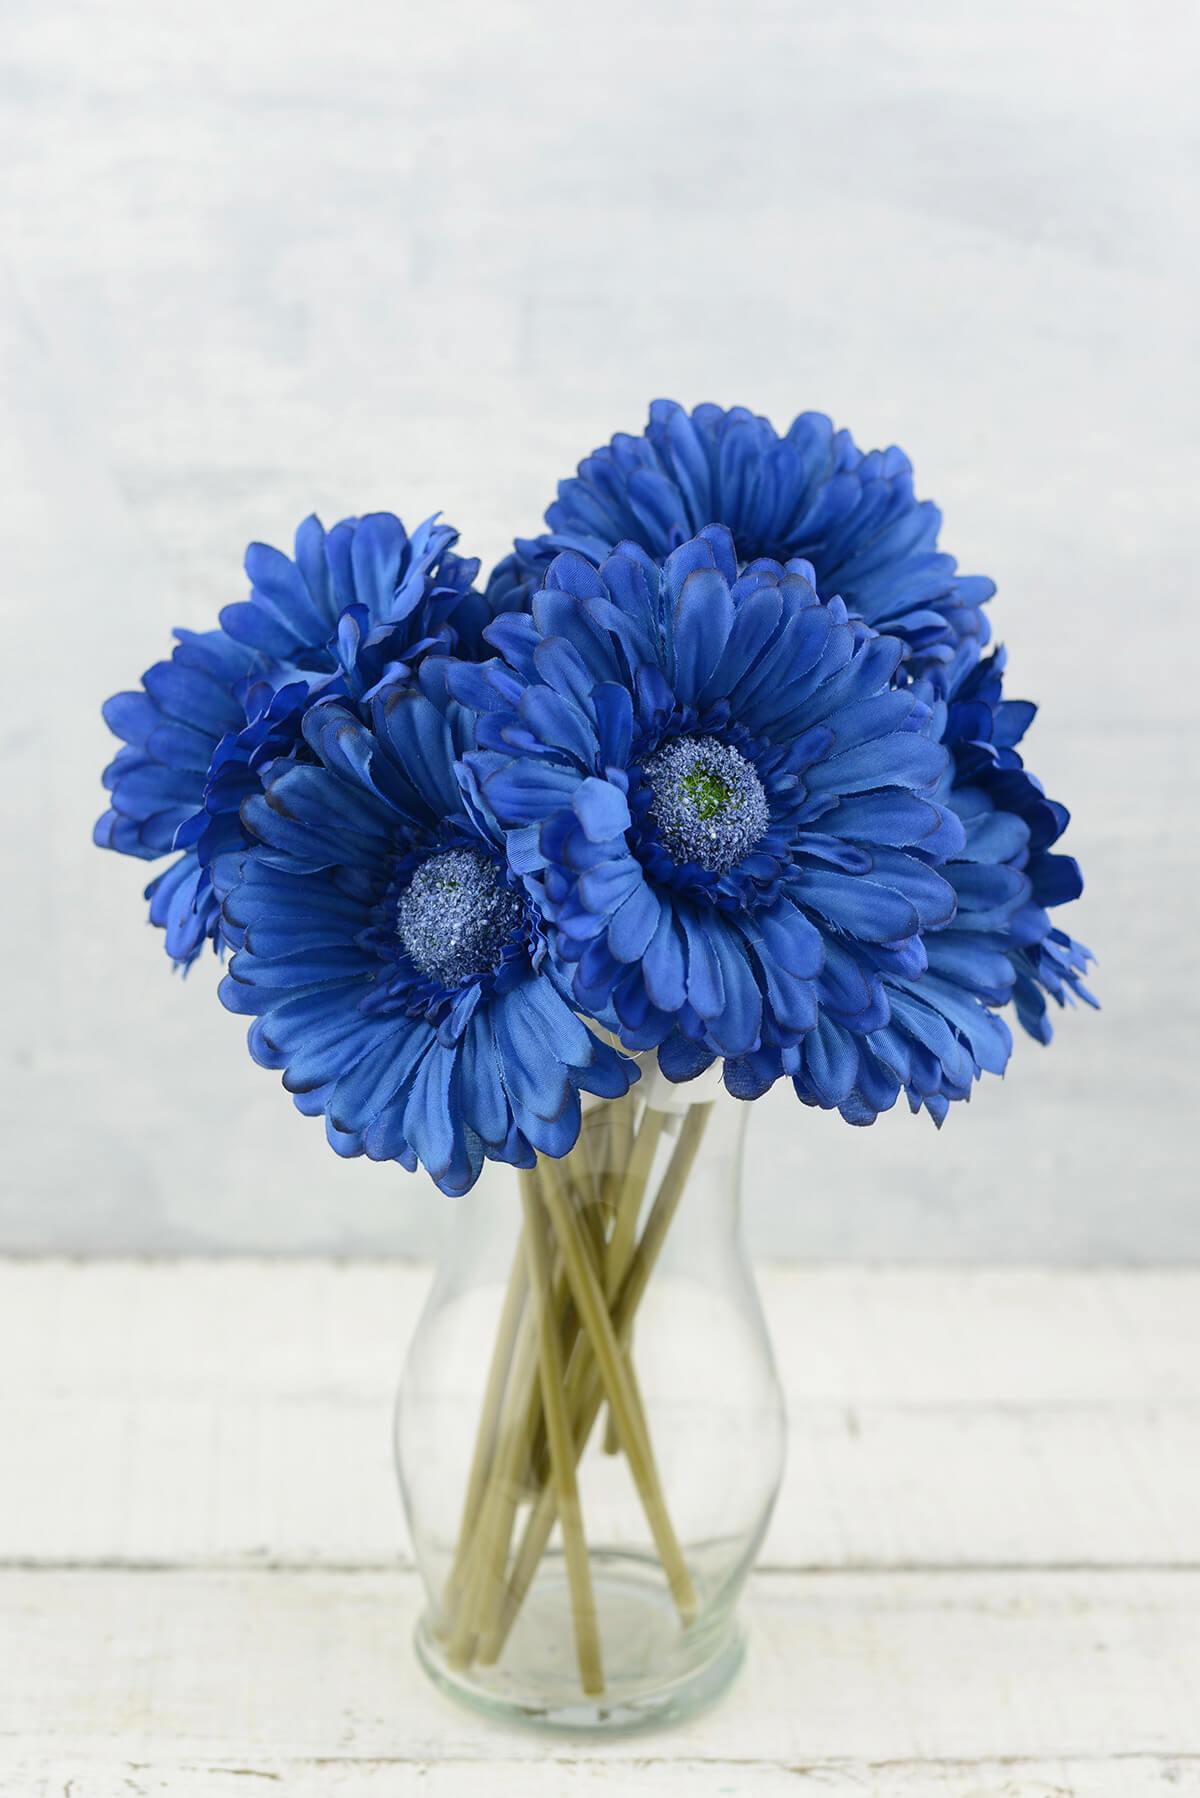 24 Blue Silk Gerbera Daisy Flowers